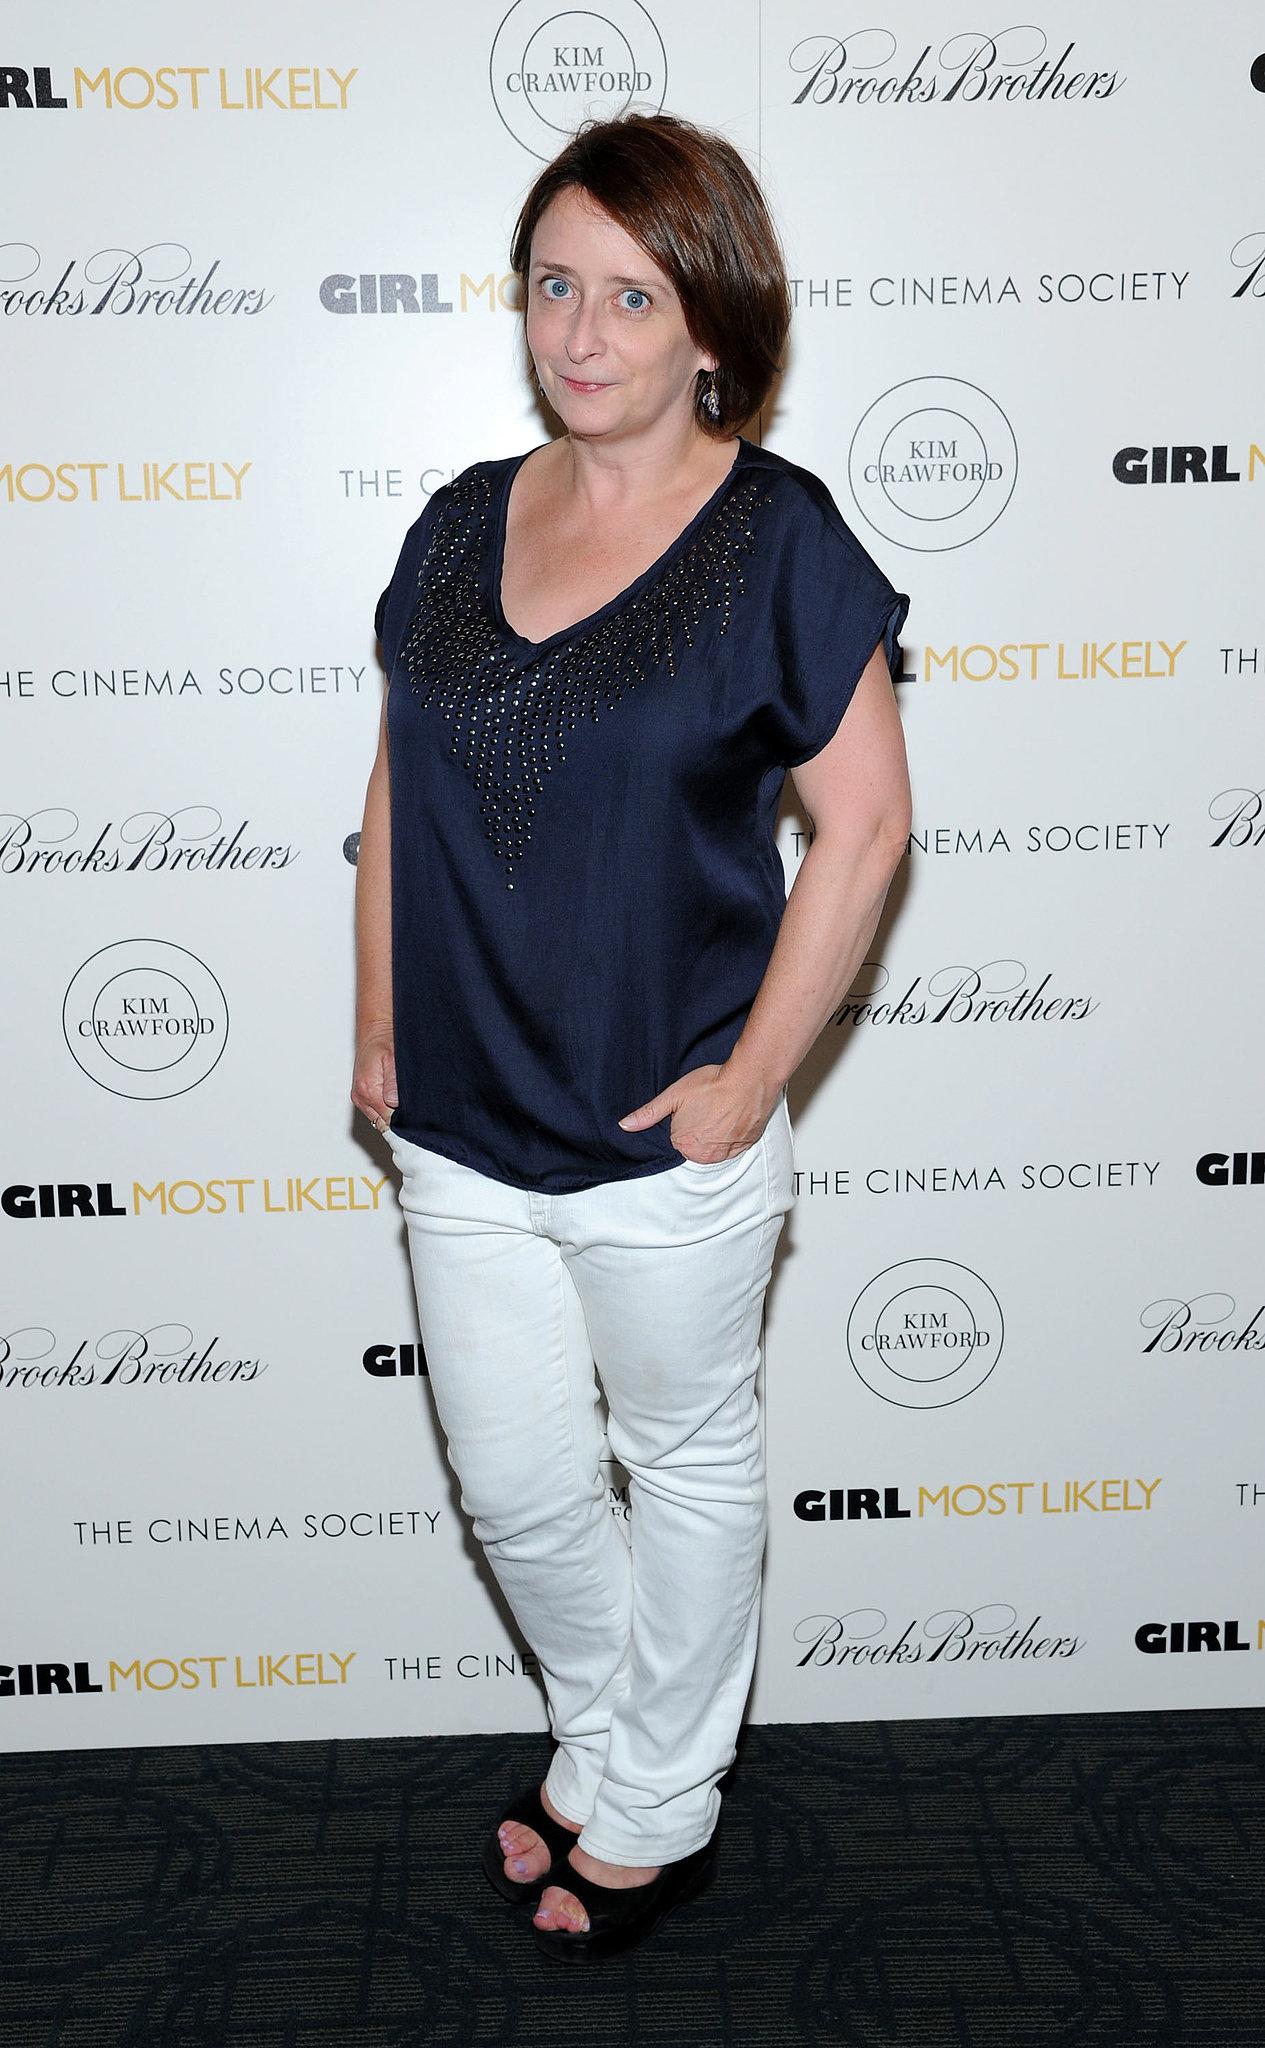 Rachel Dratch wore white pants on the black carpet.